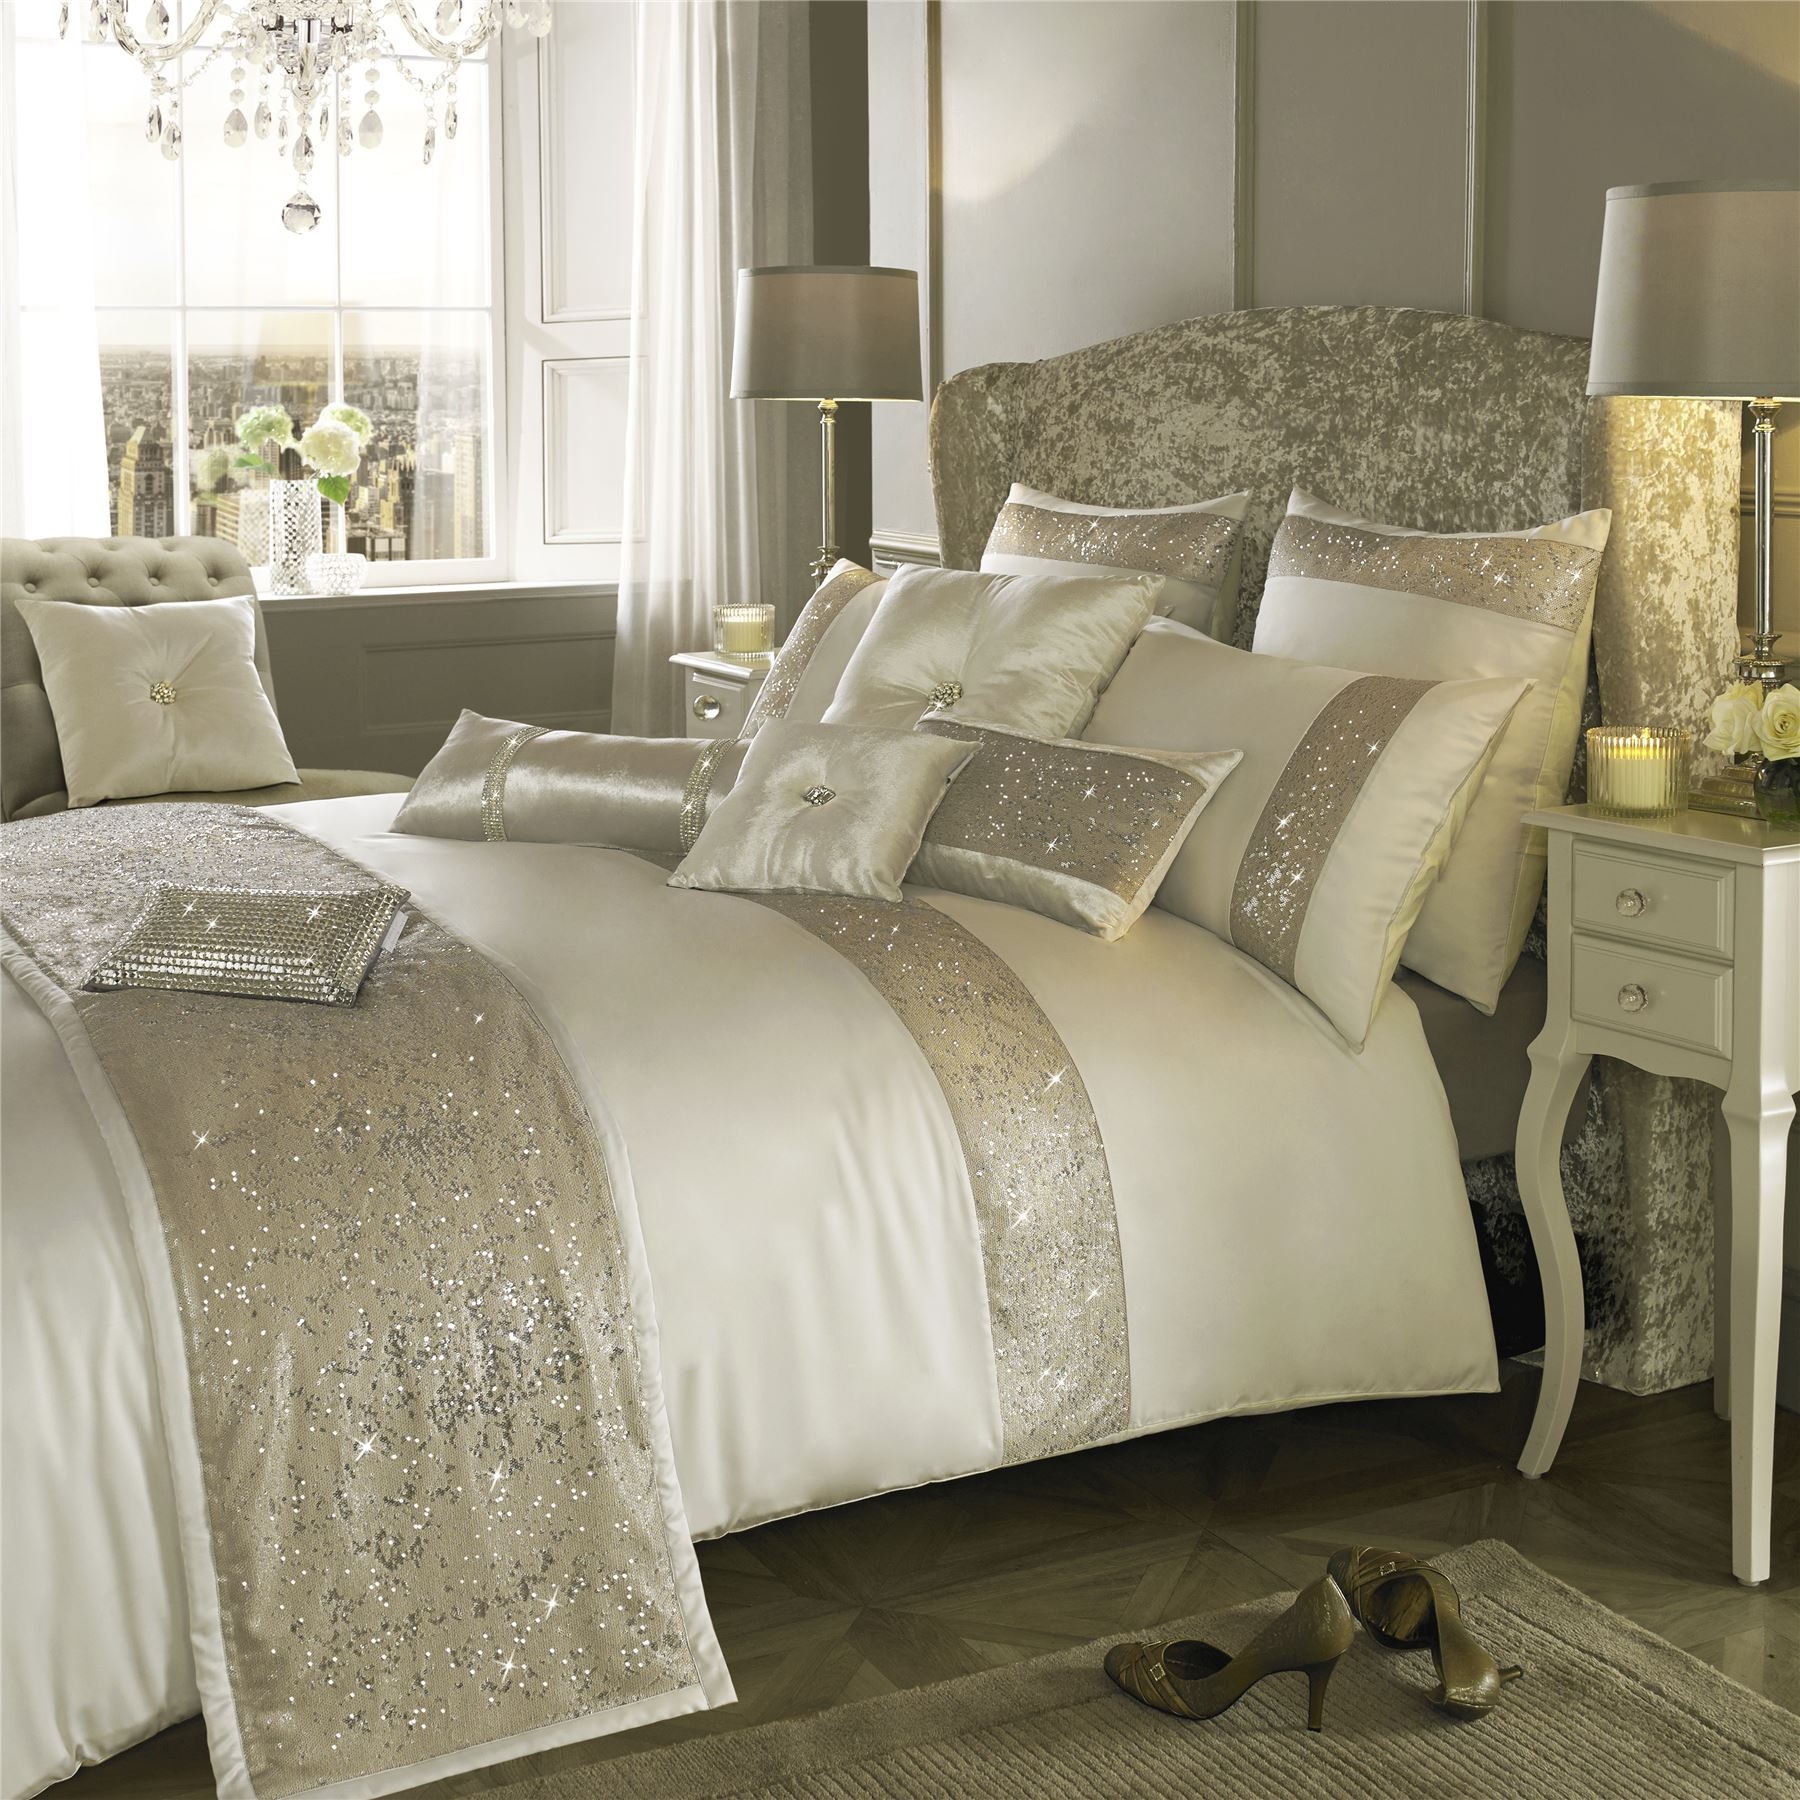 bed sets designer up htm bedding off queen piece palisades comforter sale set cotton pls to qn on